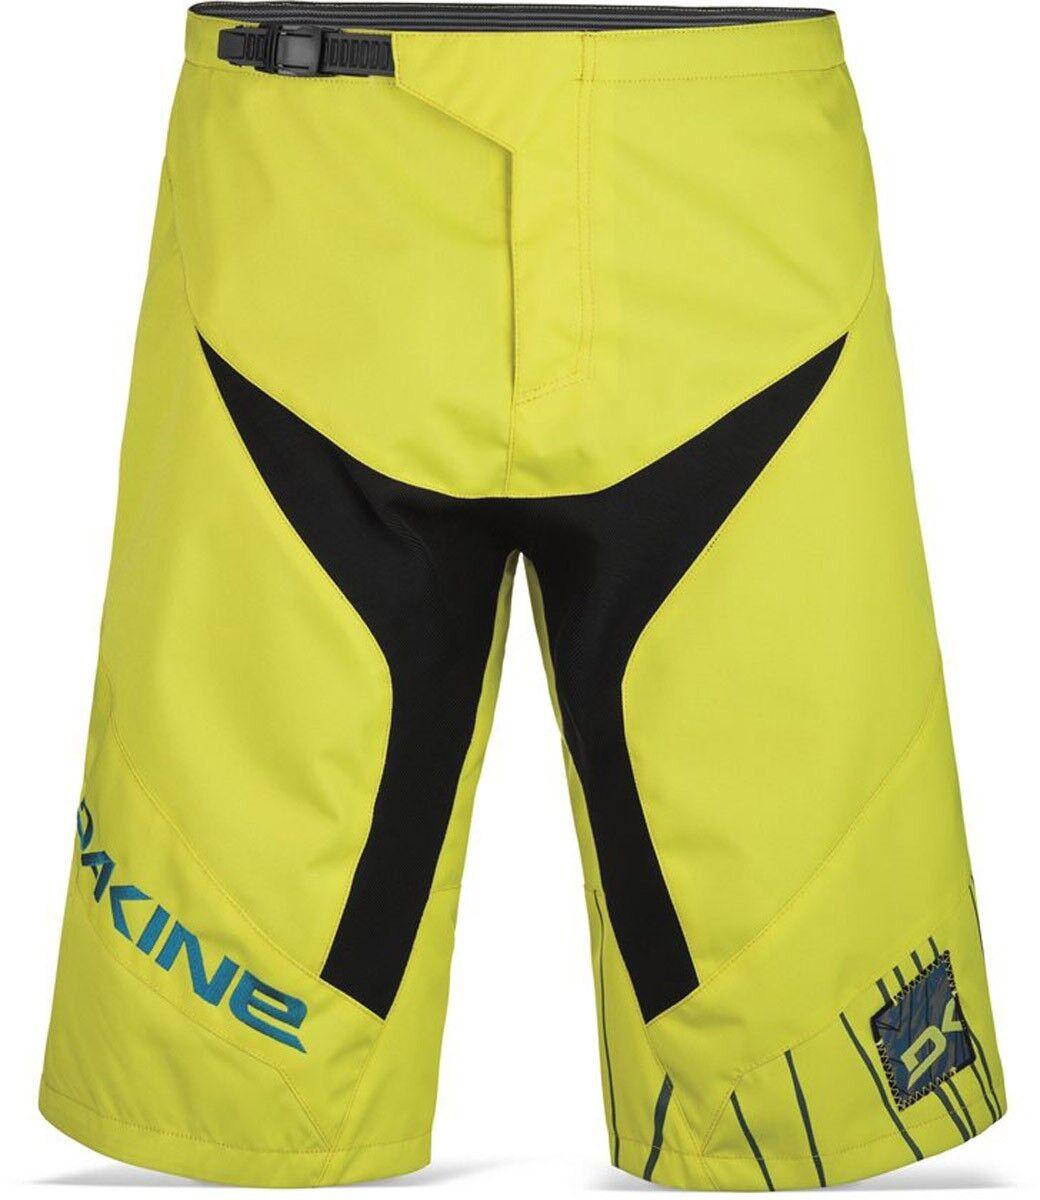 New 2016 Dakine Mens Descent Mountain Bike Cycling Shorts Sulphur 34